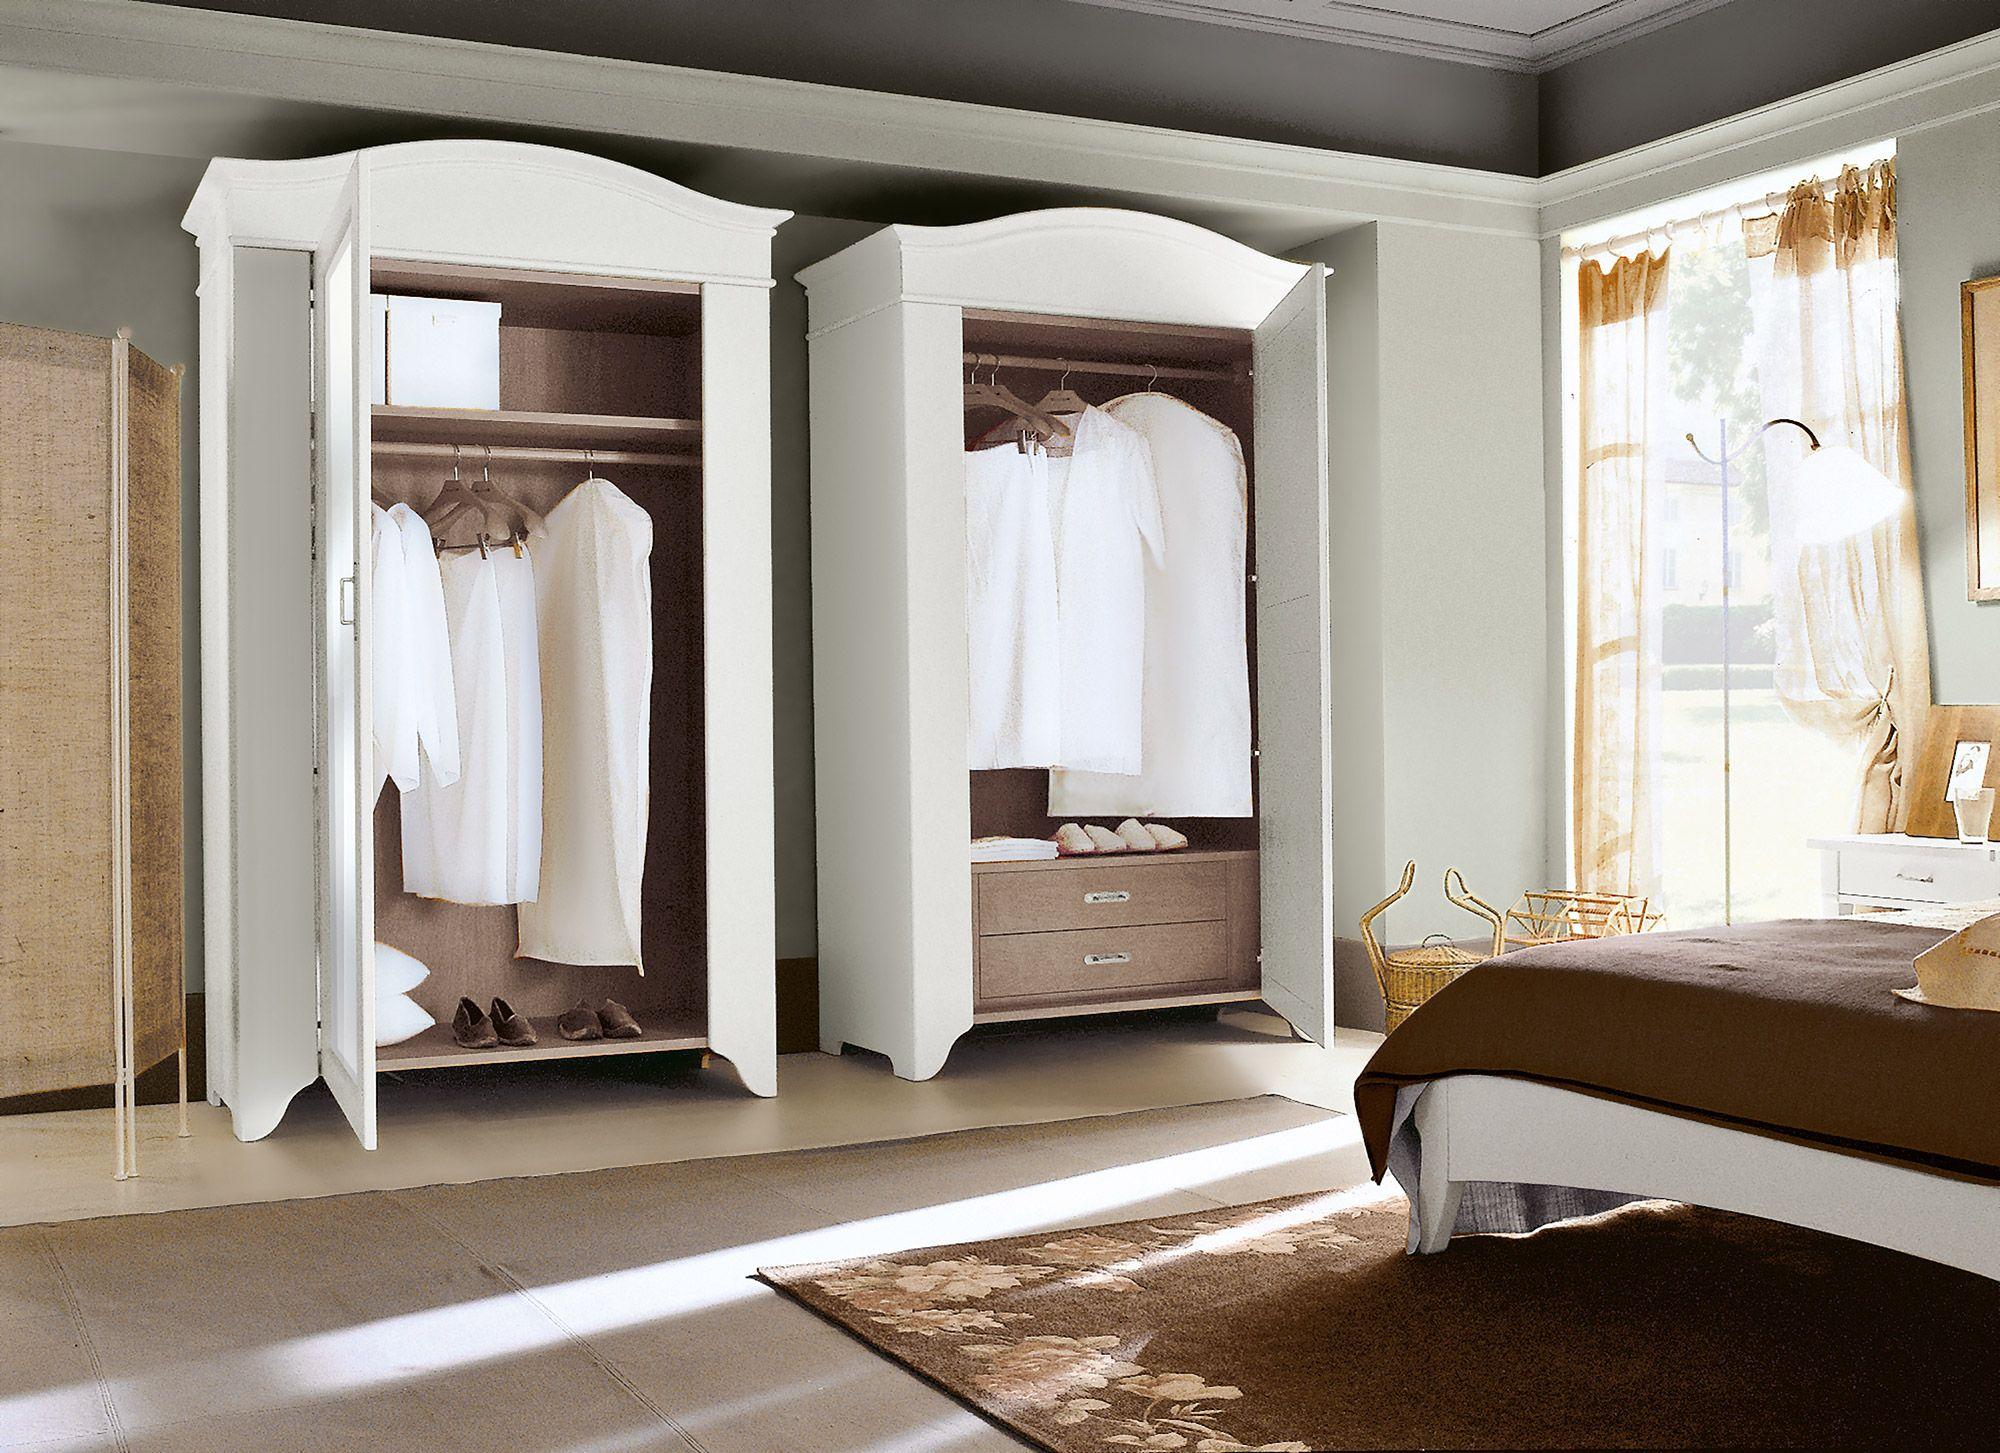 Cabina Armadio English : English mood bedroom by minacciolo minacciolo englishmood